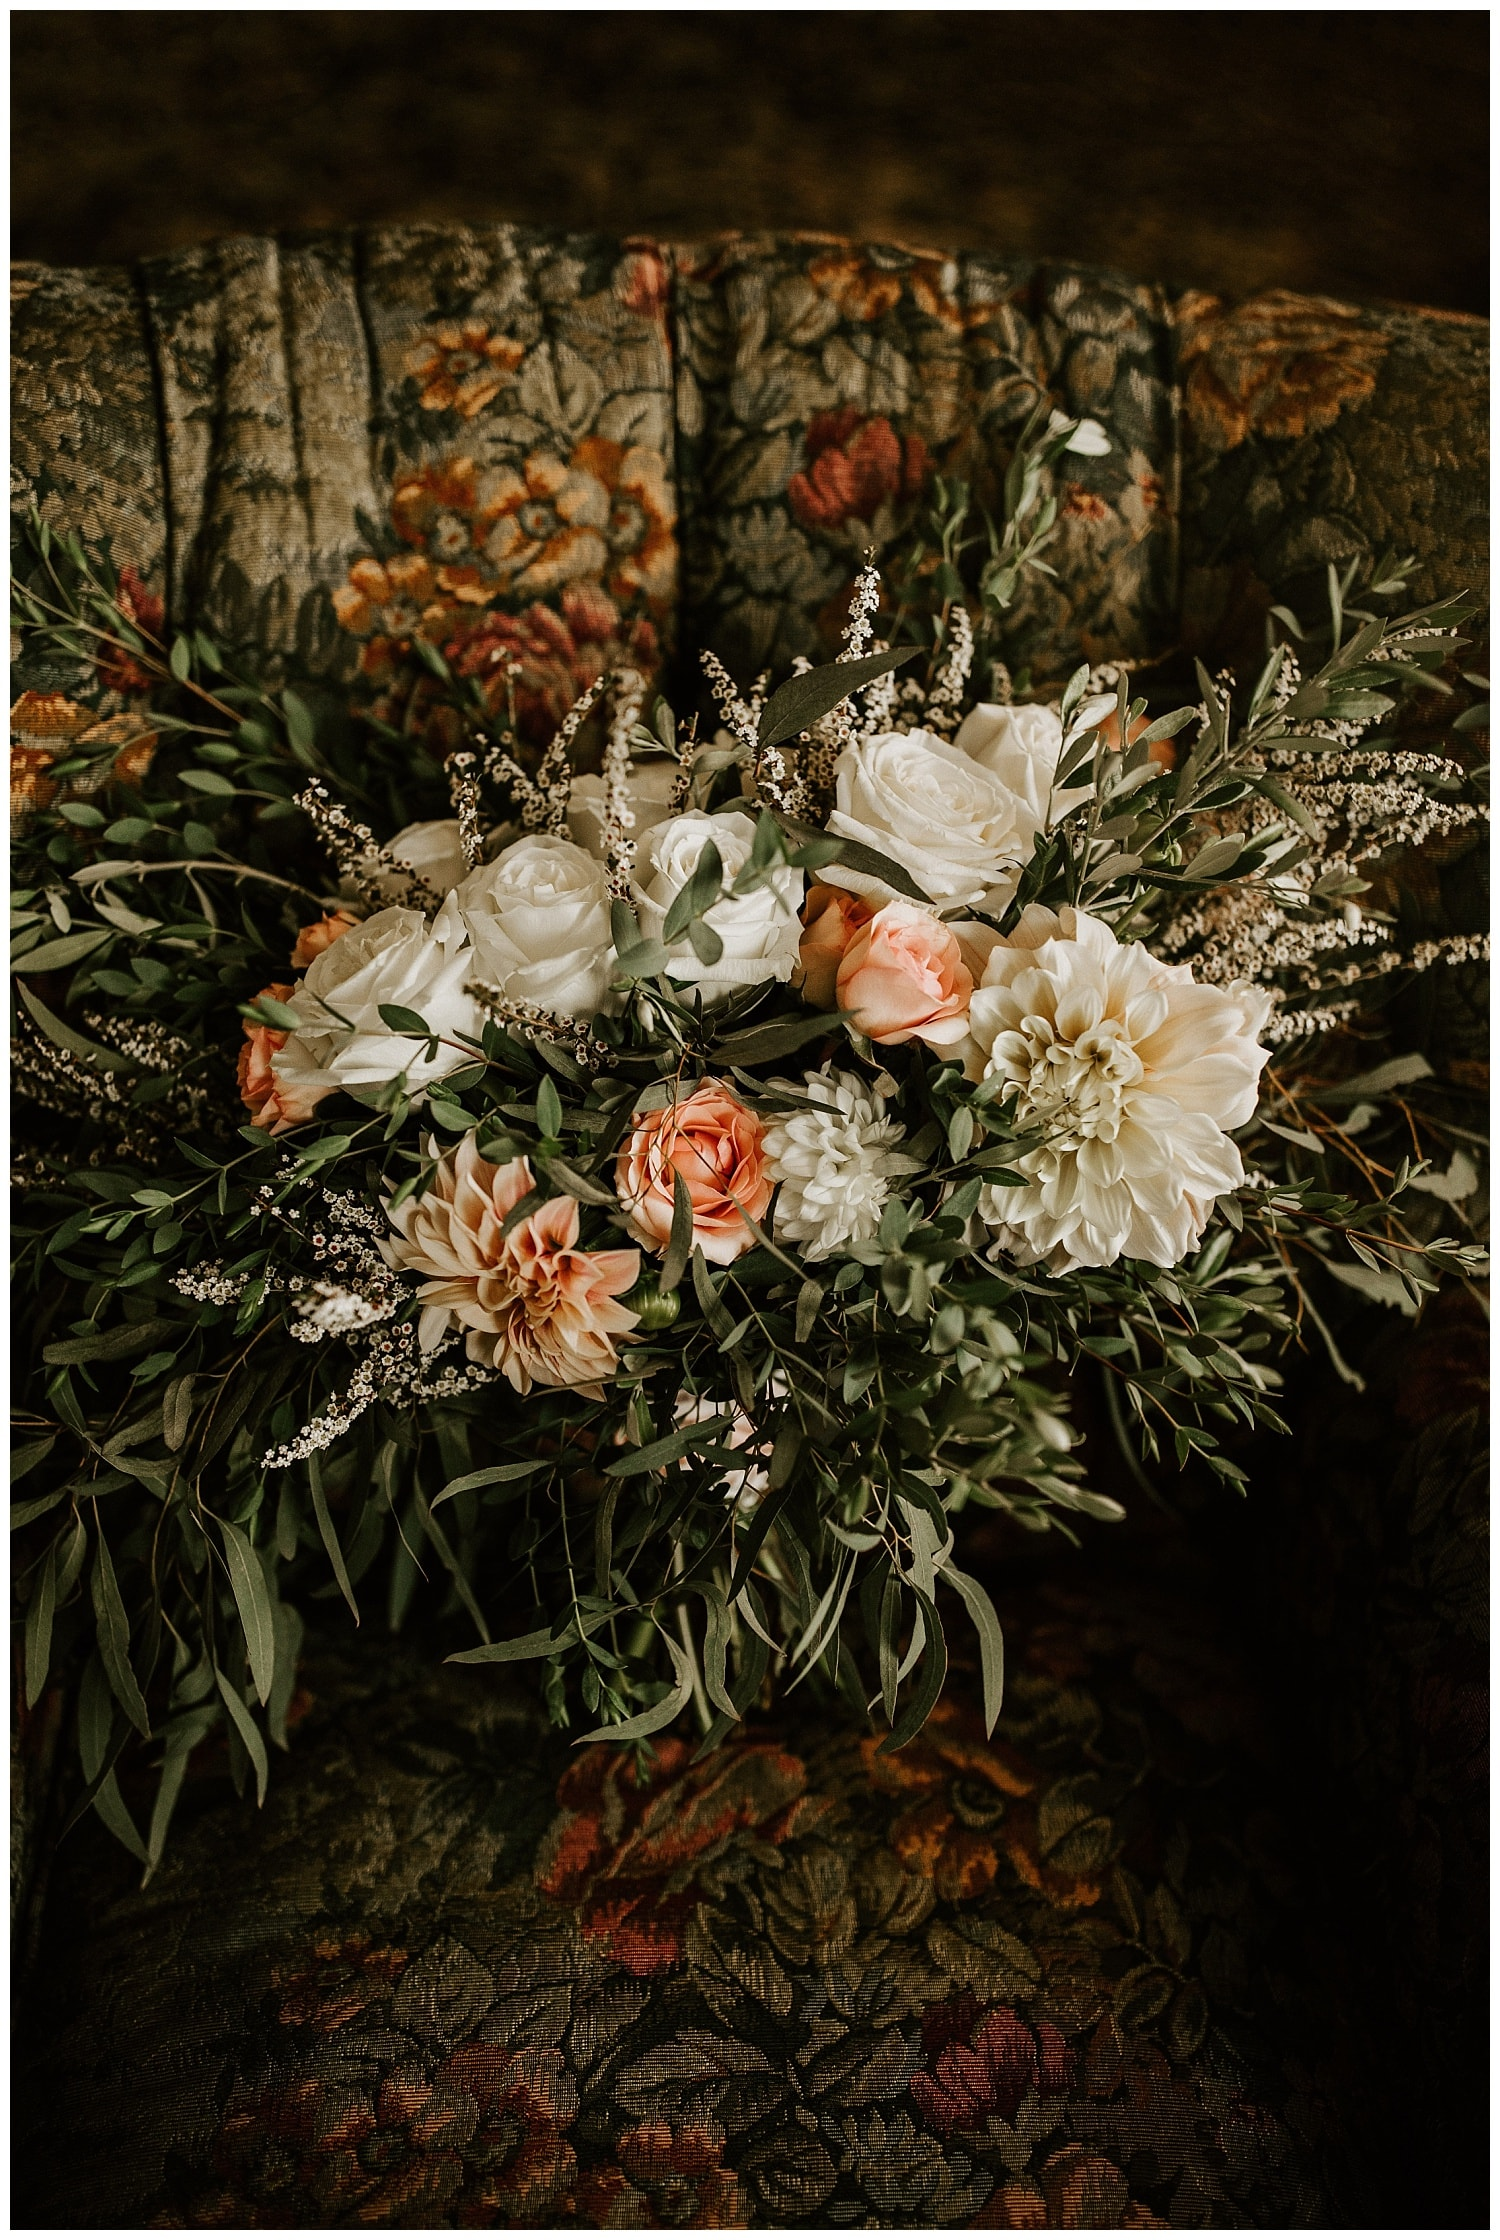 asheville elopement,asheville wedding photographer,bridal dahlia bouquet,carnegie resort wedding,carver's gap elopement,knoxville wedding photographer,nashville wedding photographer,roan mountain elopement,roan mountain wedding,